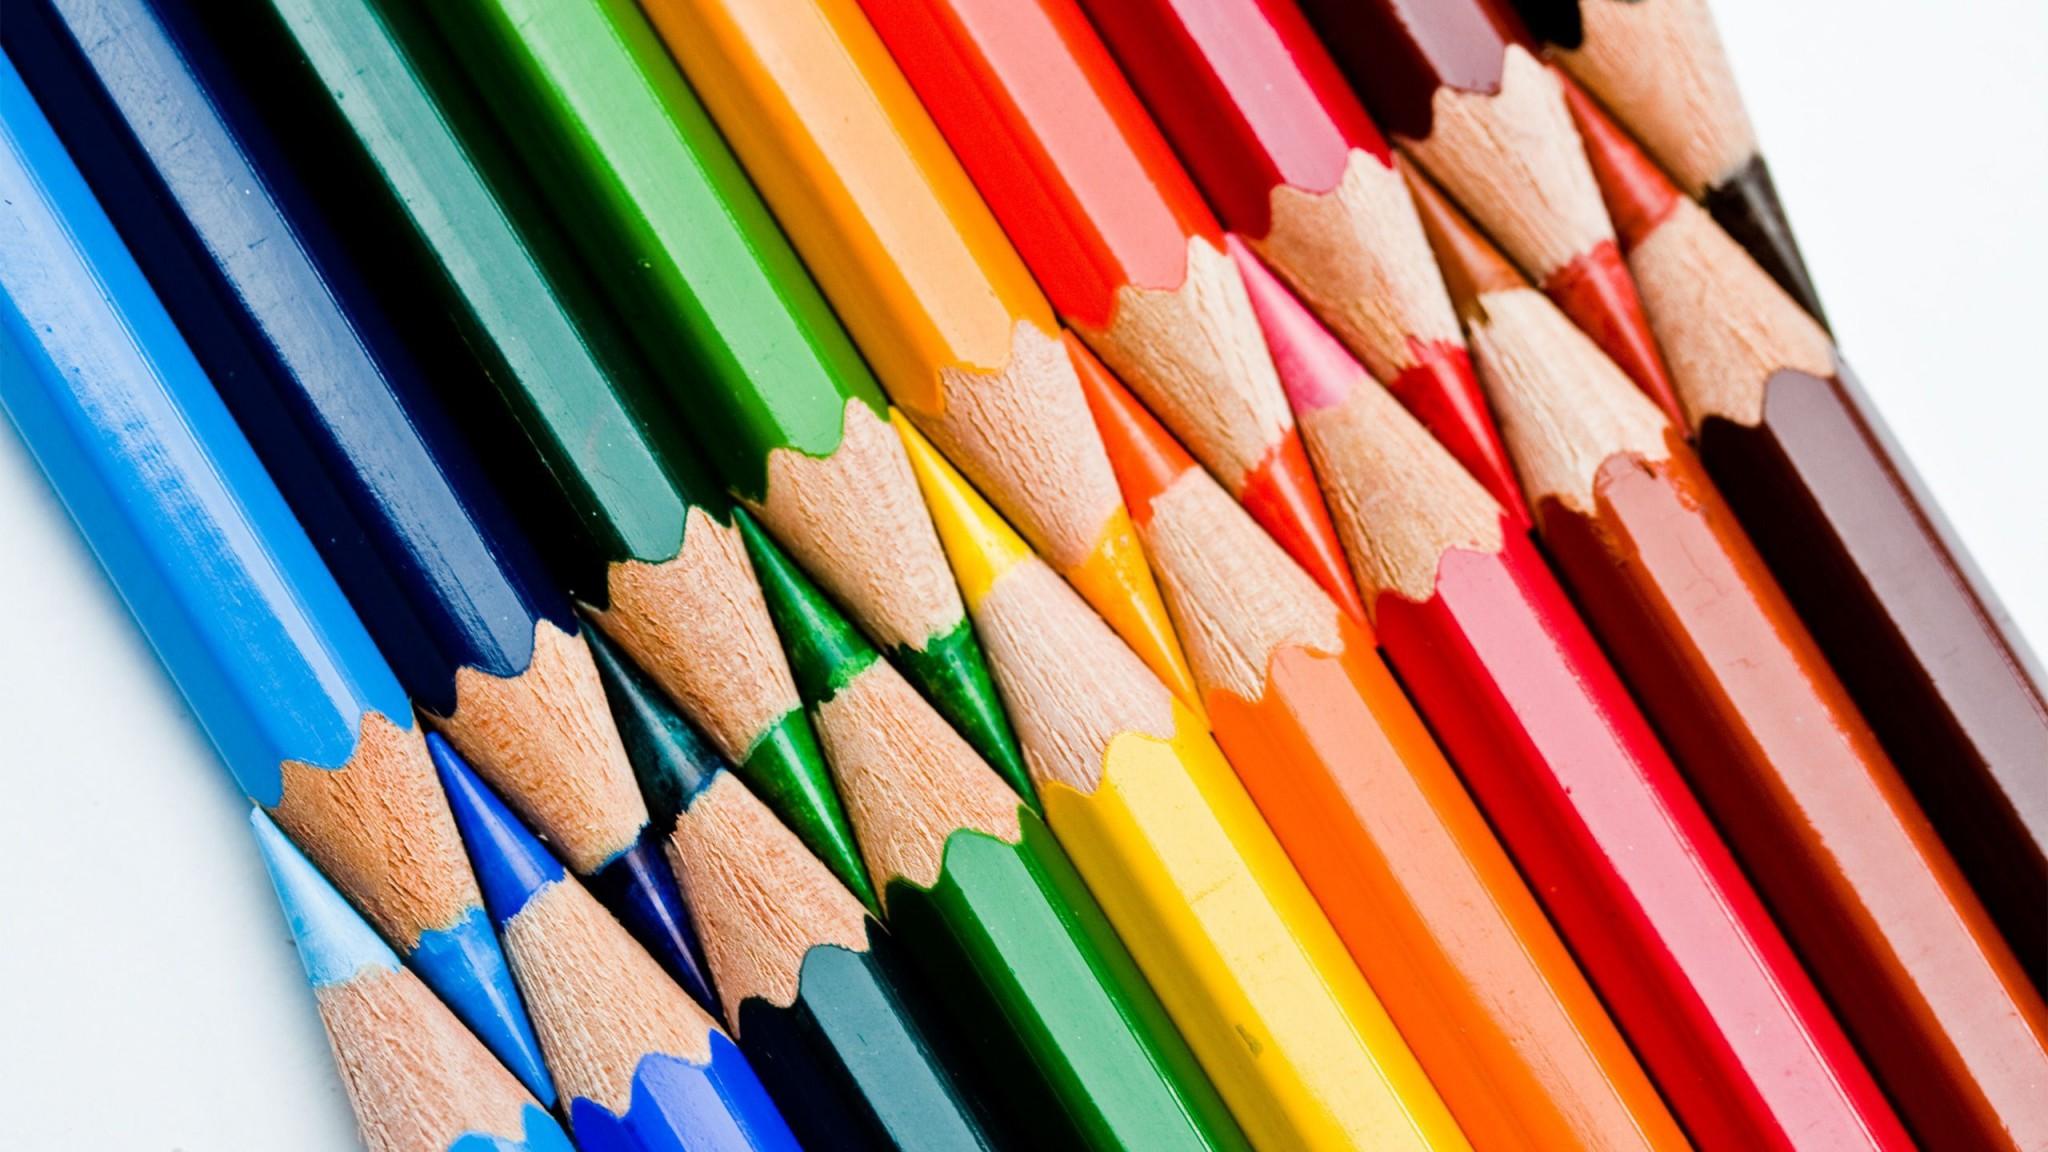 Crayon Wallpaper; Crayon Wallpaper ...